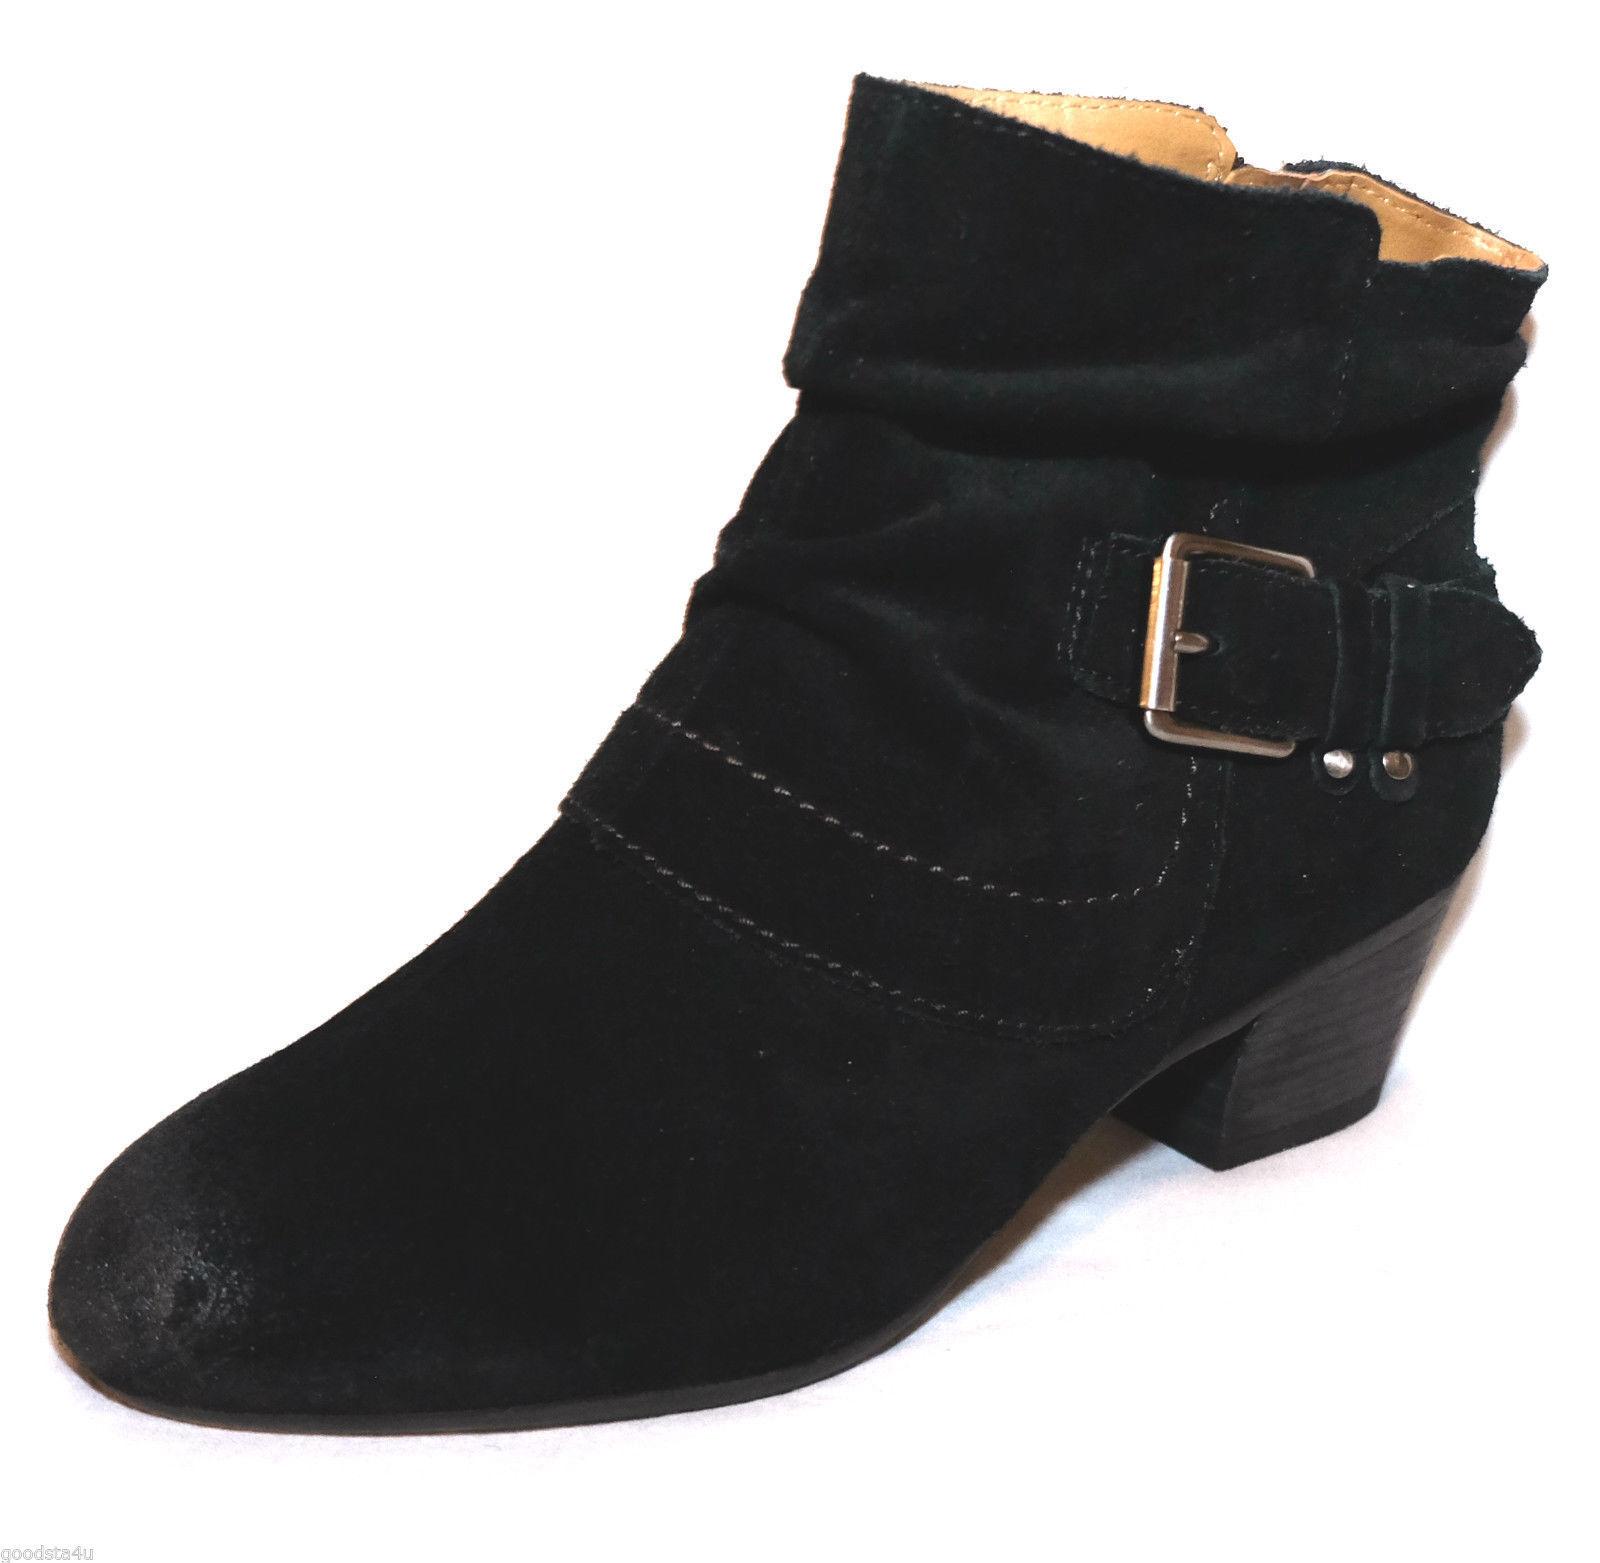 womens Clarks ladies ancle boots MELANIE JUDE black suede size 8 d